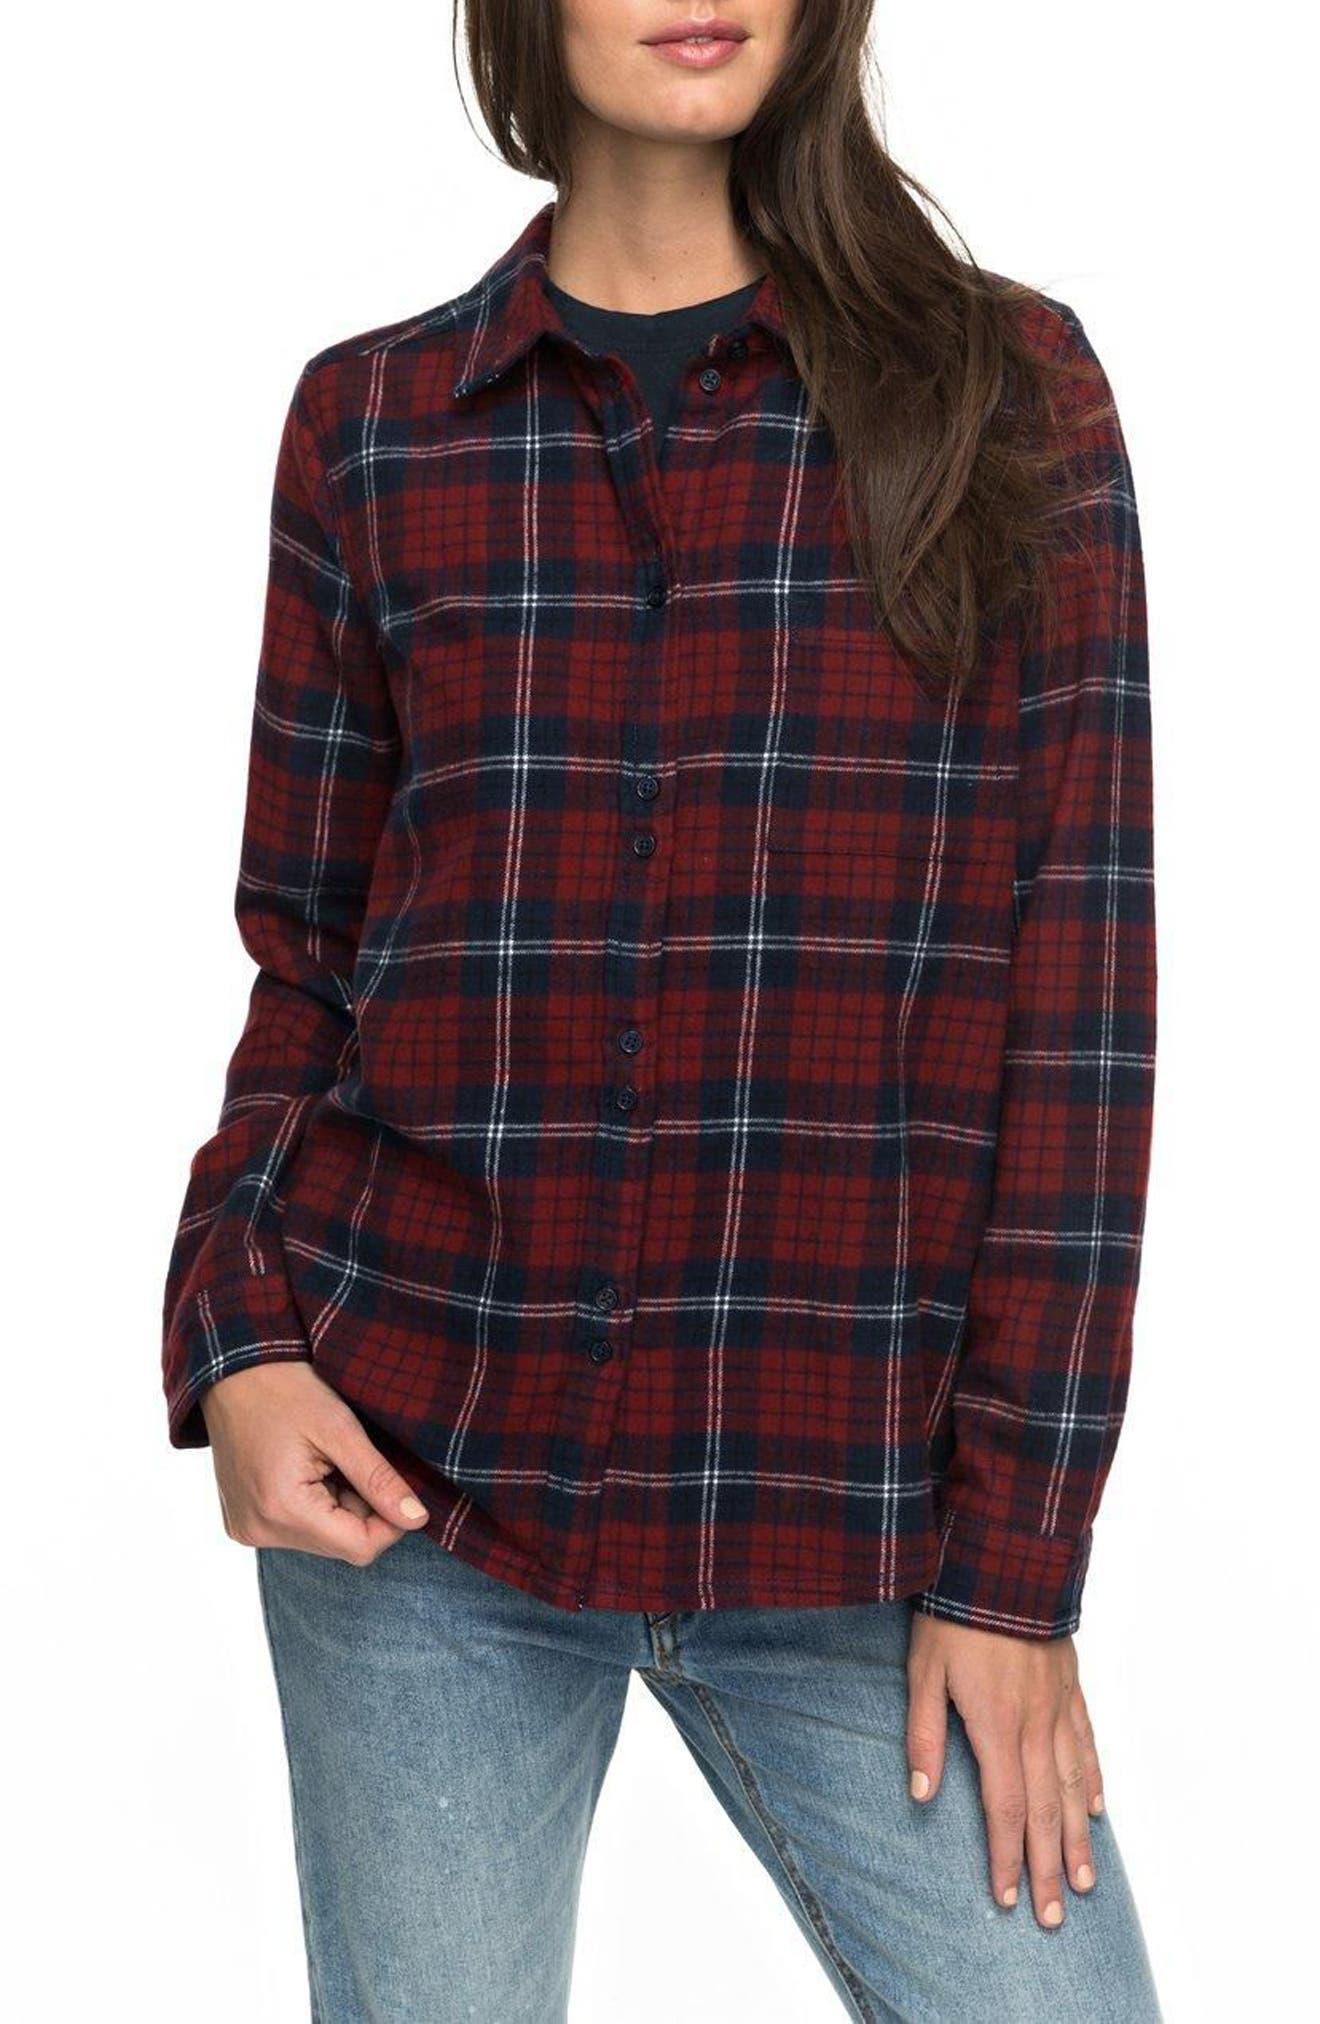 Heavy Feelings Plaid Shirt,                         Main,                         color, Red